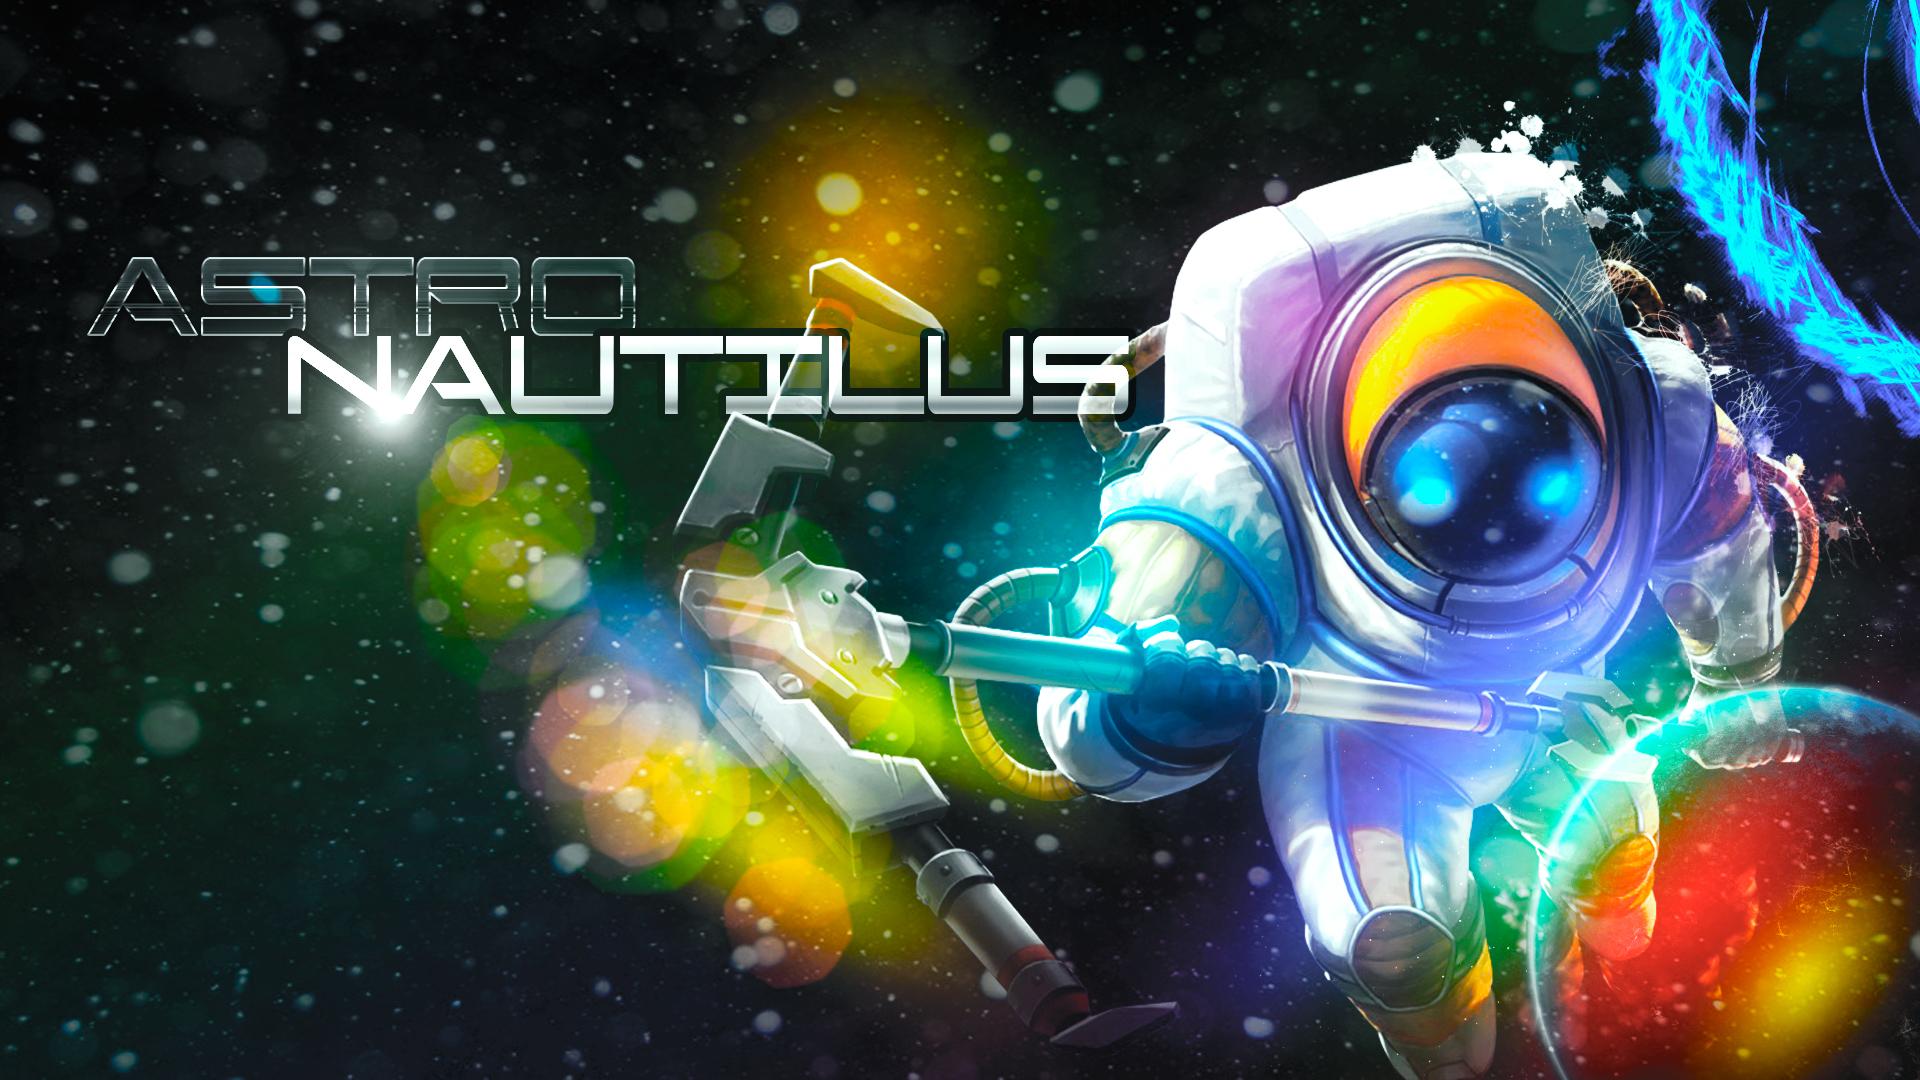 Astro Nautilus Wallpaper Full HD by pedrovovp 1920x1080